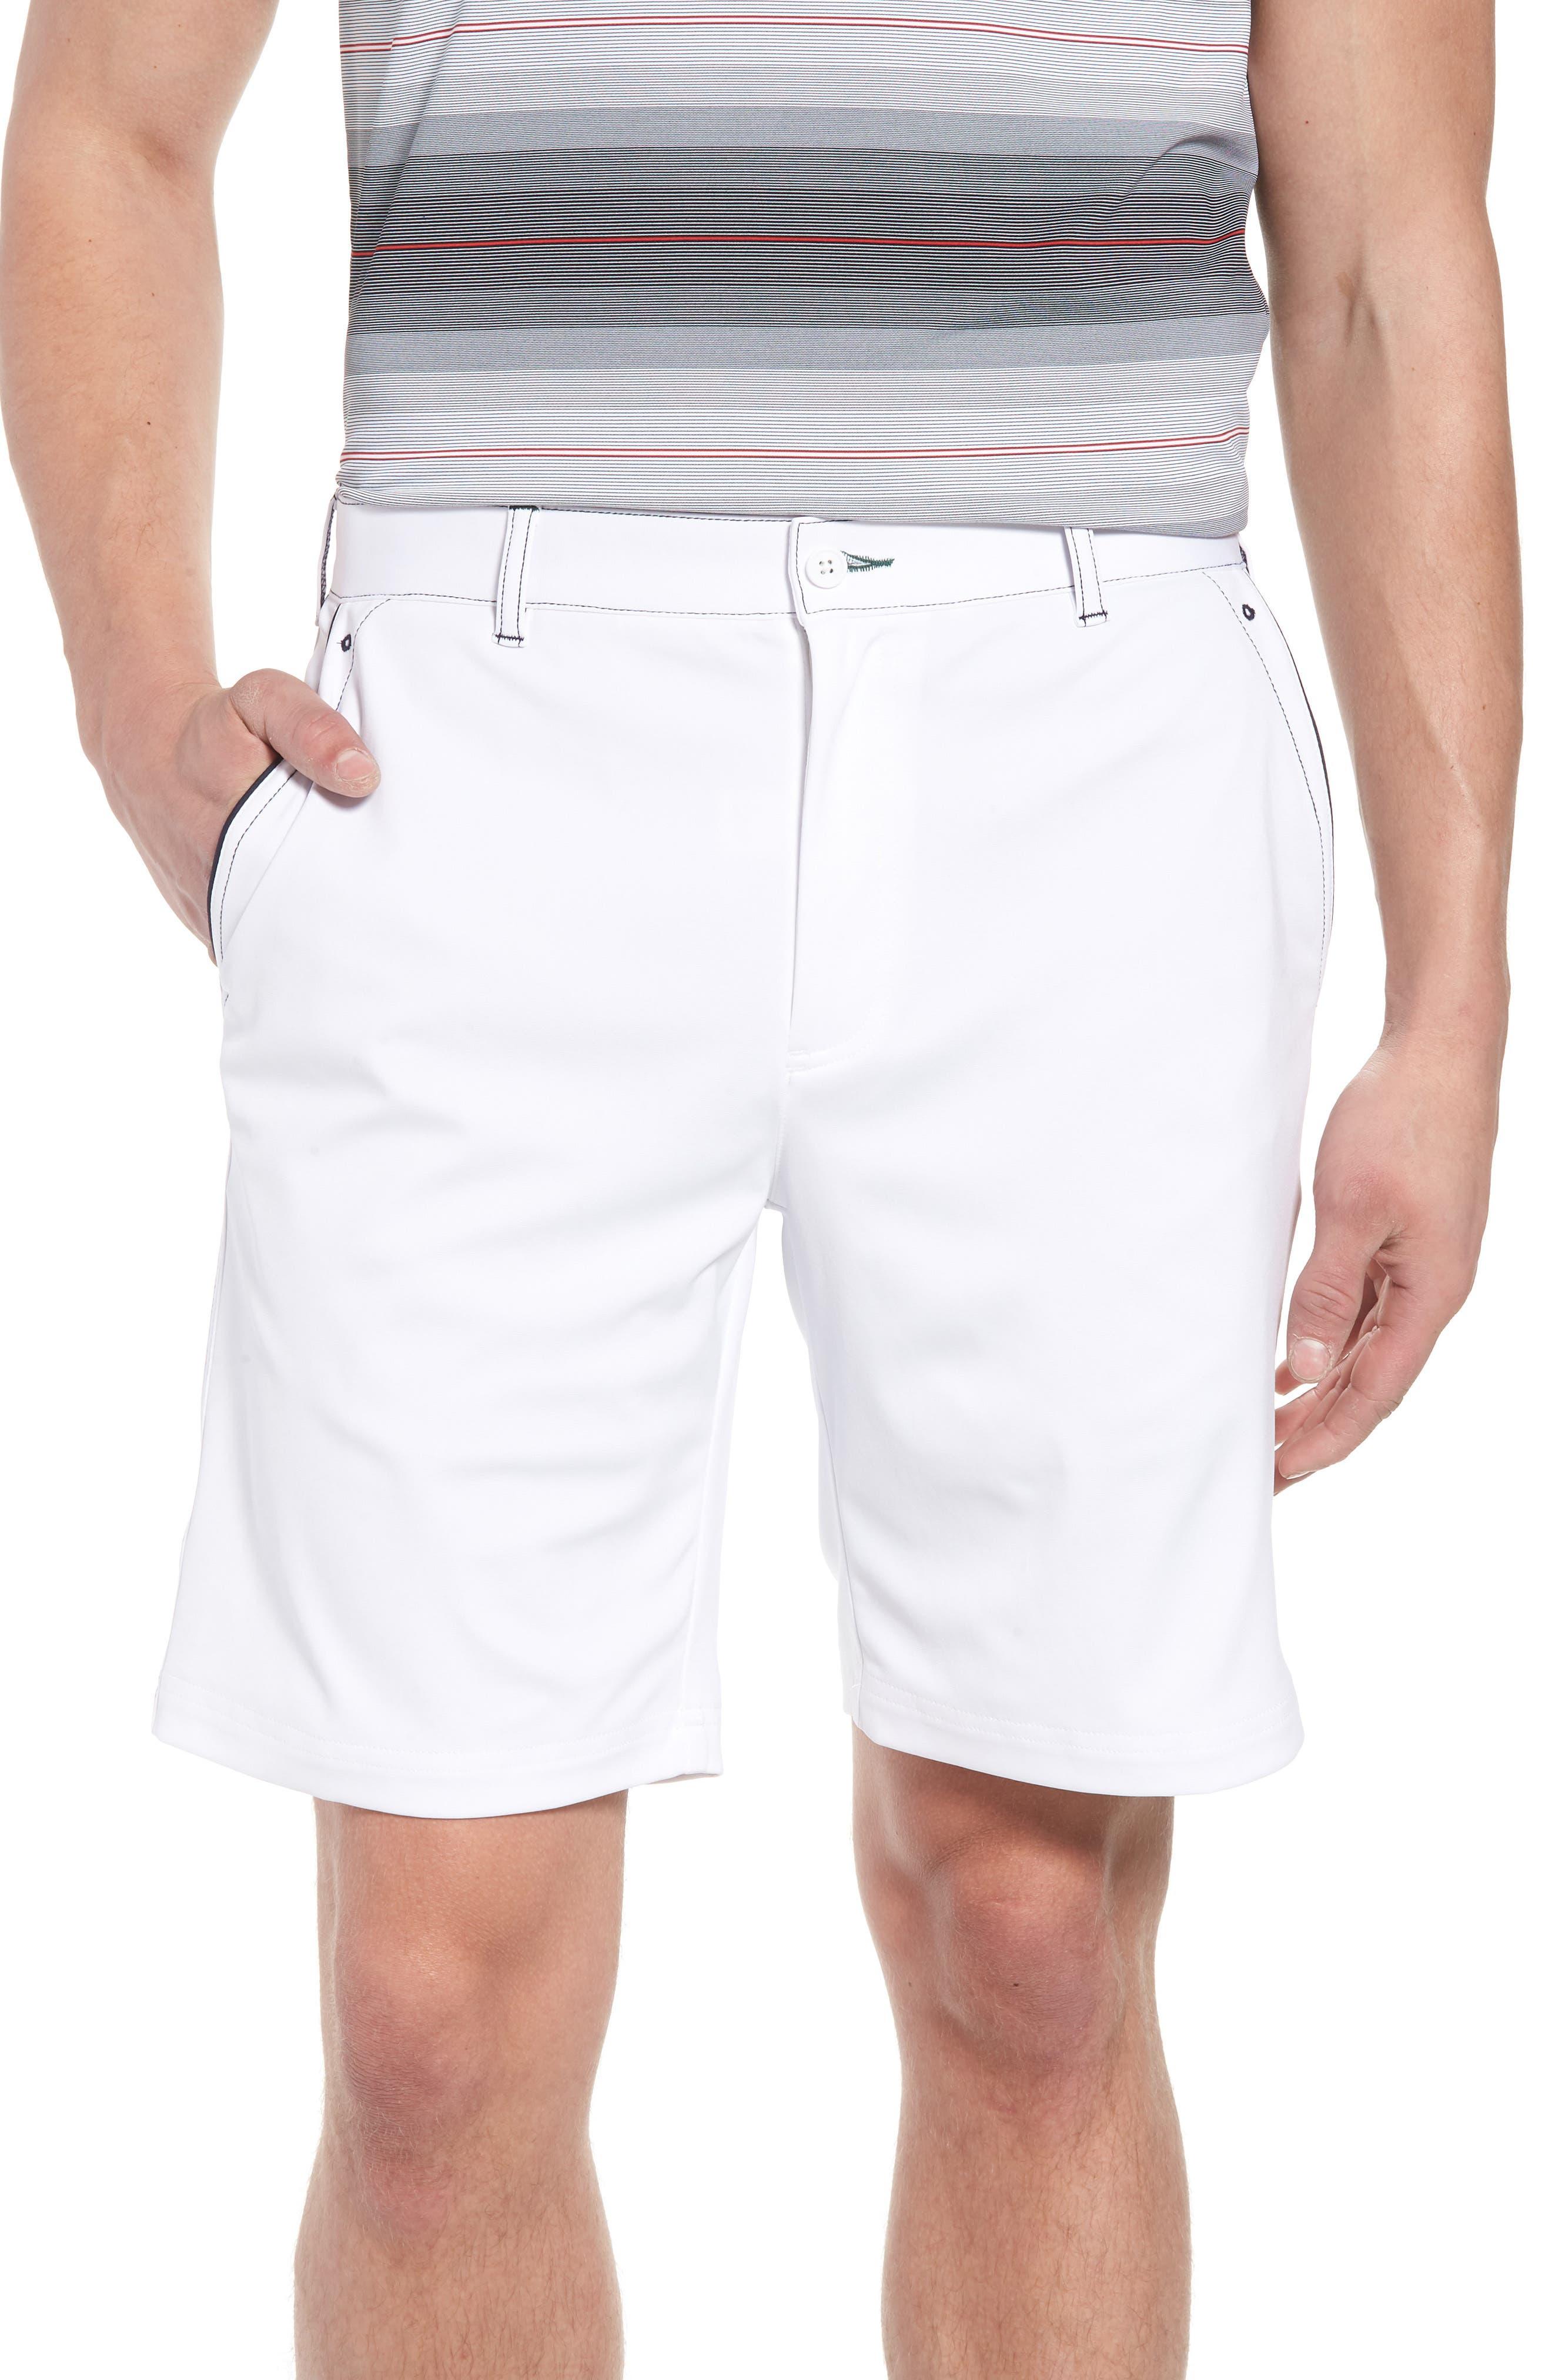 Trim Fit Tech Chino Shorts,                             Main thumbnail 1, color,                             White